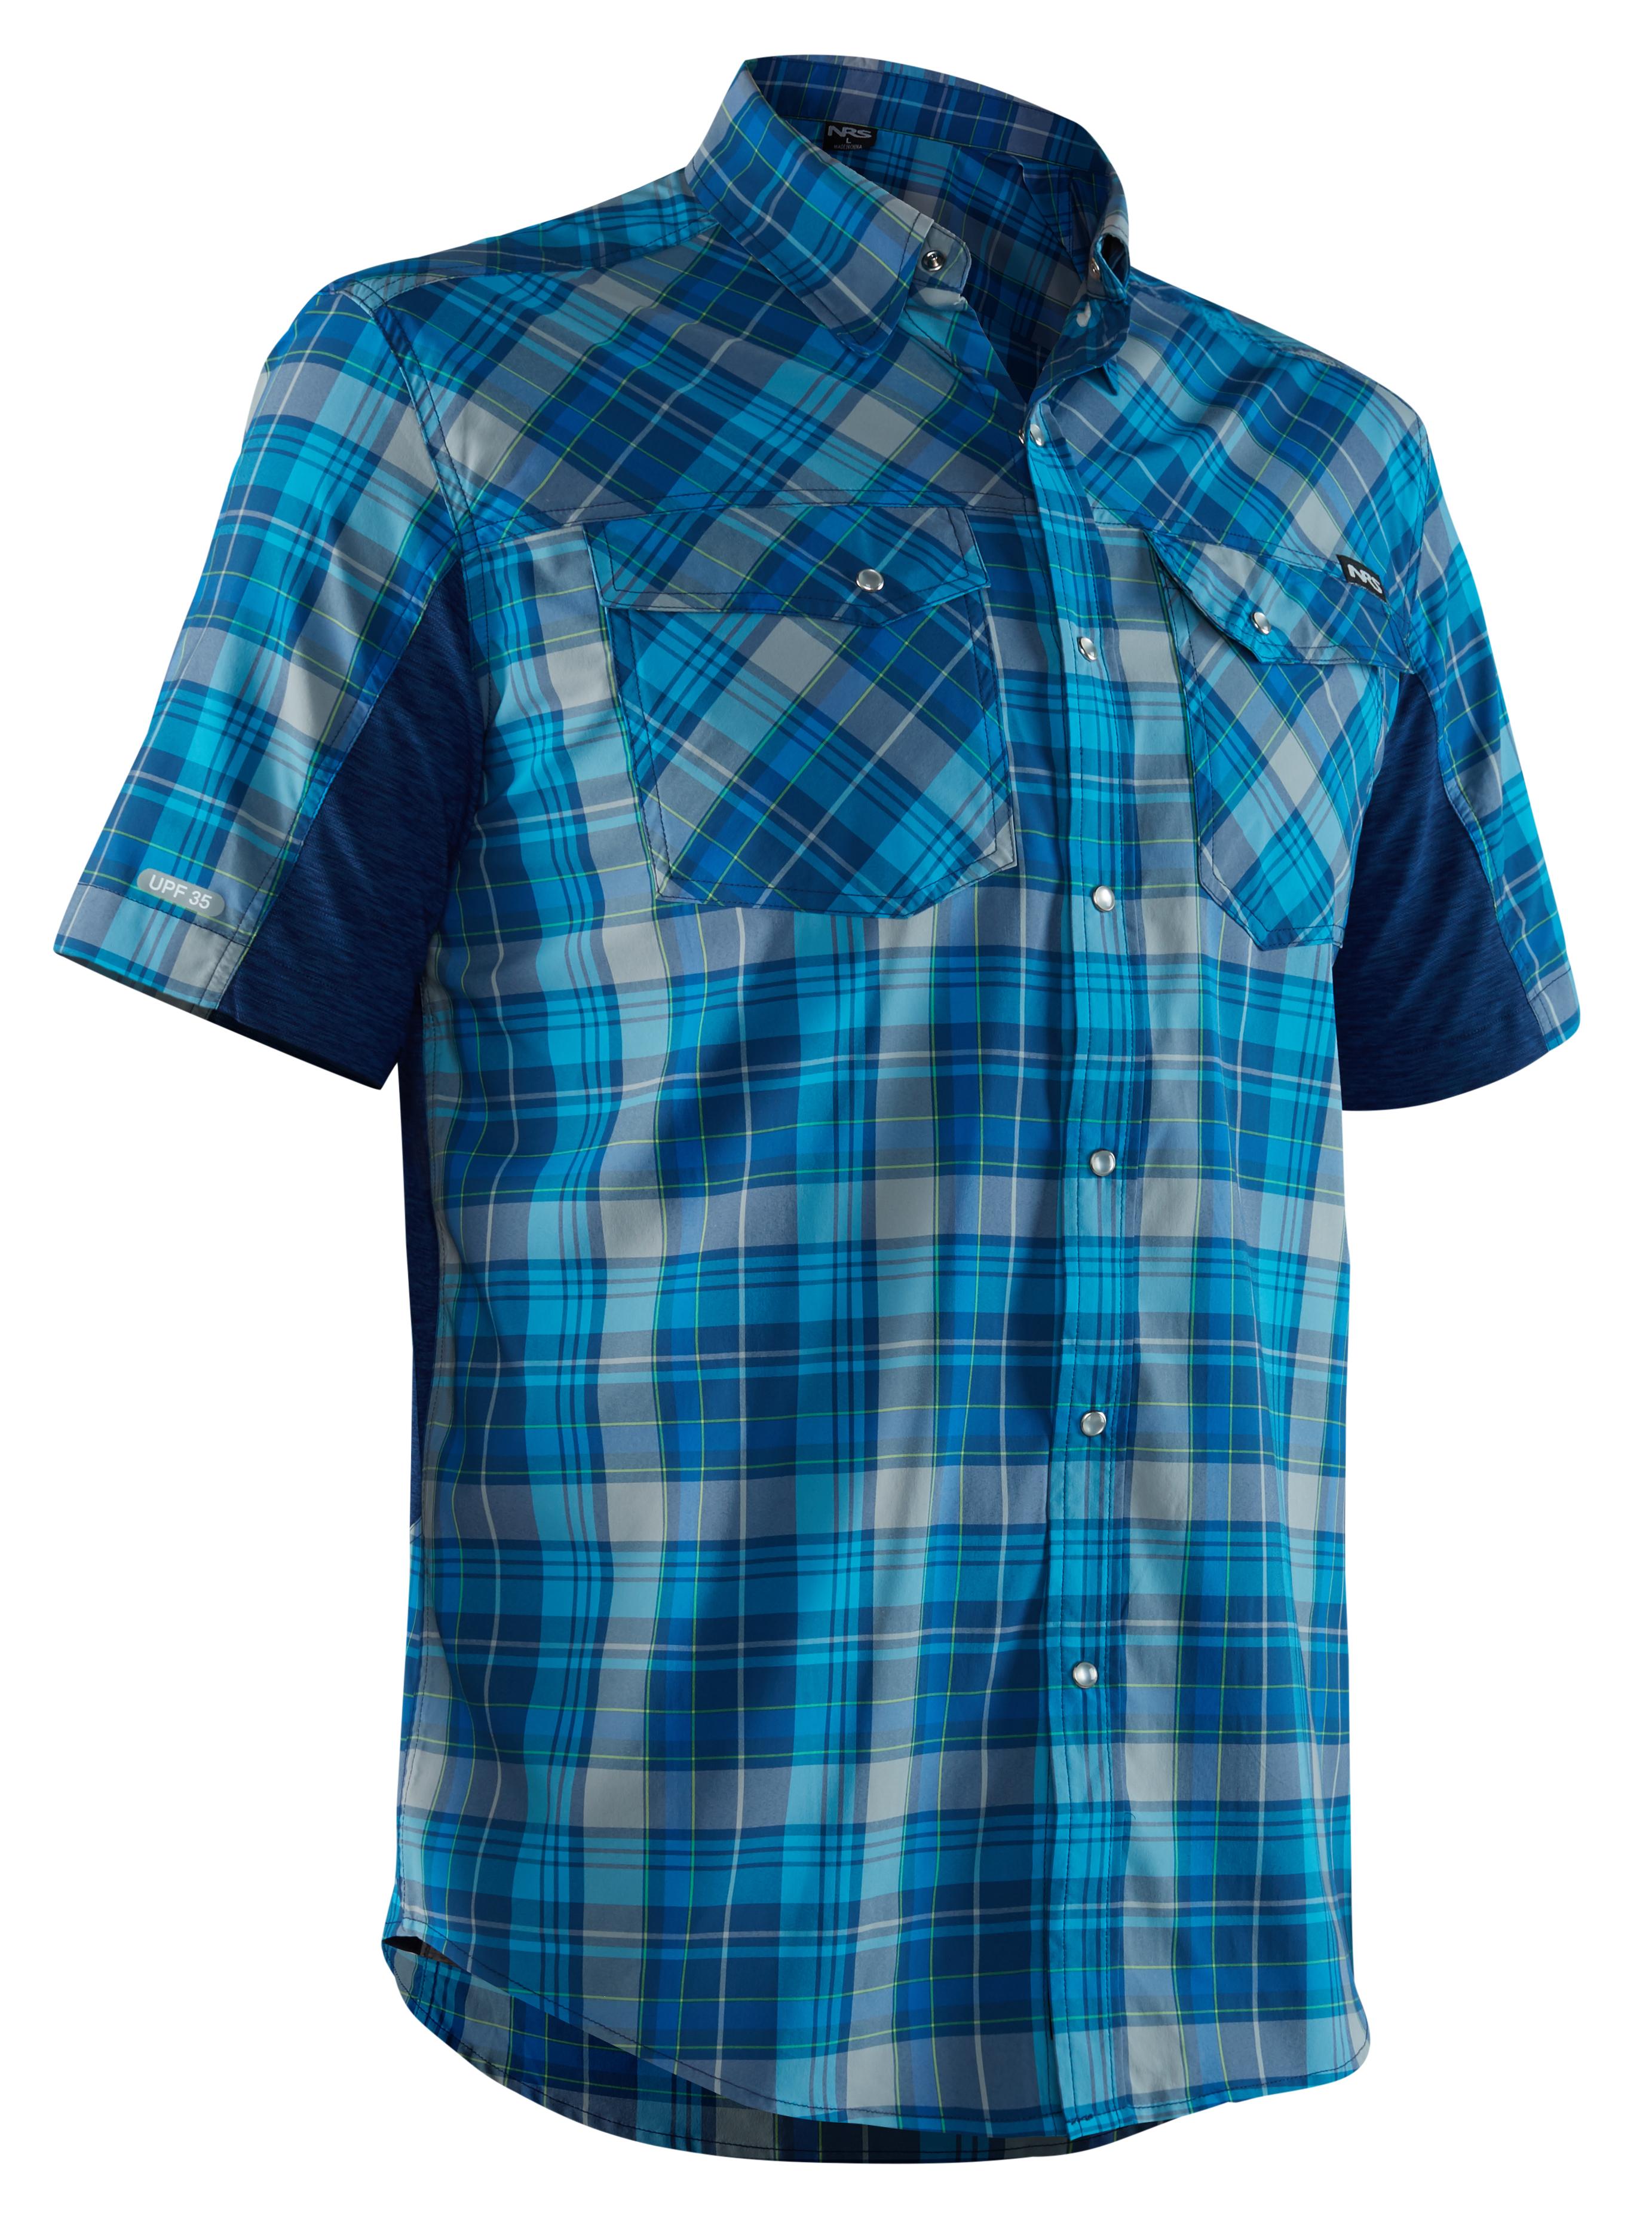 2018 NRS Men's Guide Short-Sleeve Shirt